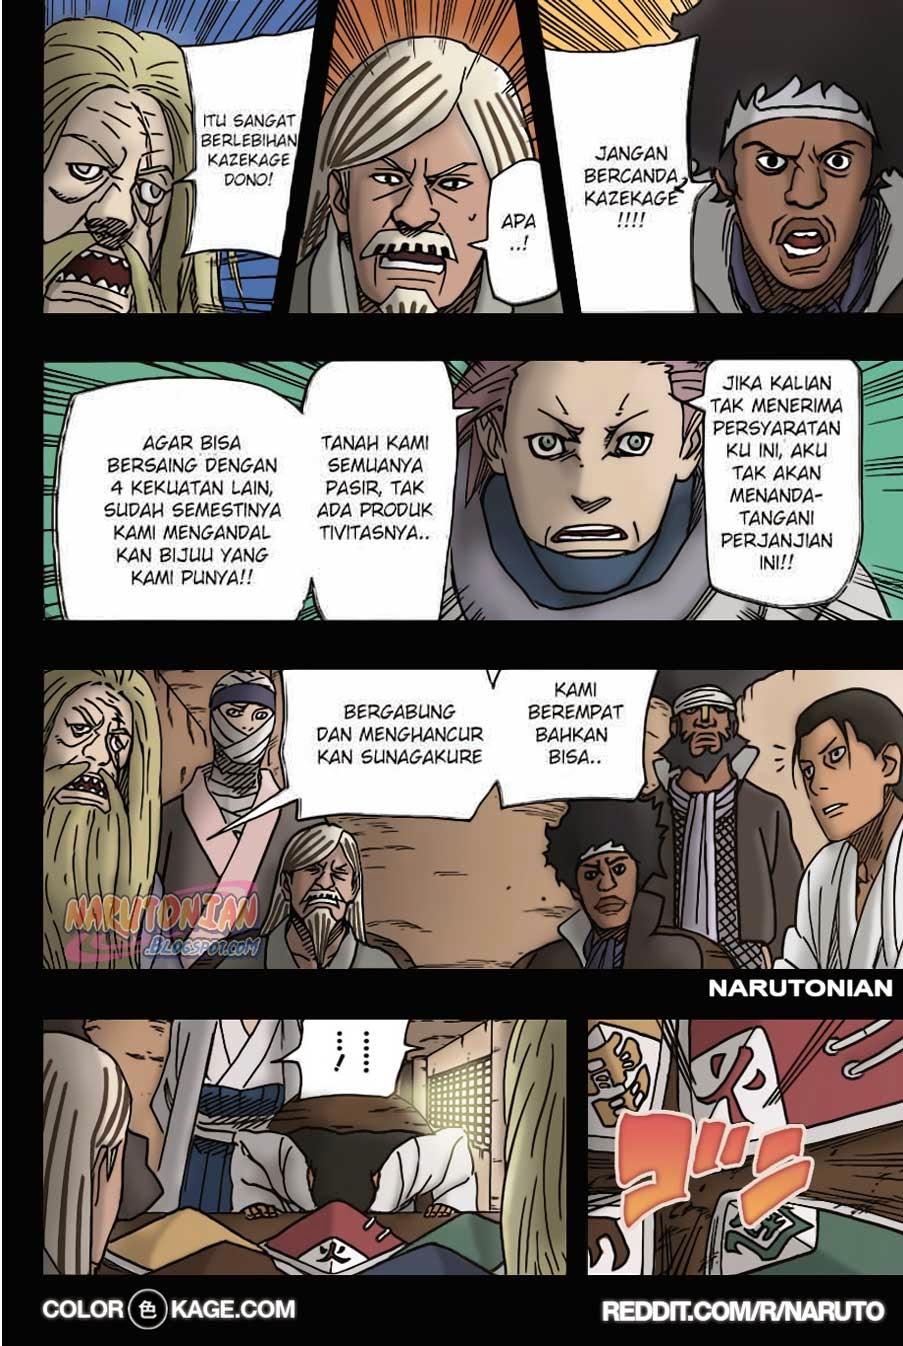 Dilarang COPAS - situs resmi www.mangacanblog.com - Komik naruto berwarna 648 - impian seorang shinobi 649 Indonesia naruto berwarna 648 - impian seorang shinobi Terbaru 12|Baca Manga Komik Indonesia|Mangacan